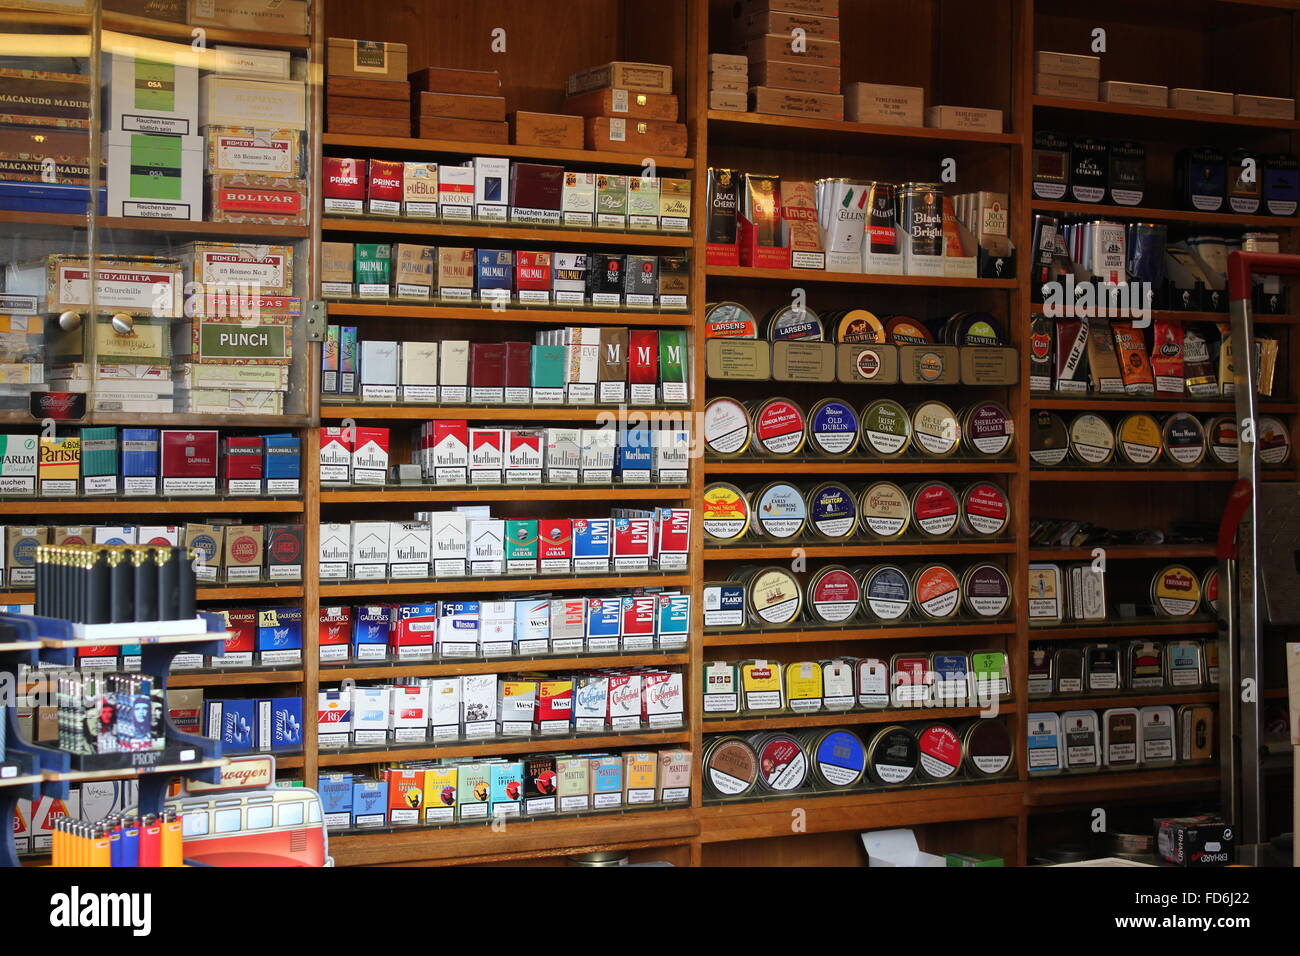 Marlboro blue cigarettesmin UK